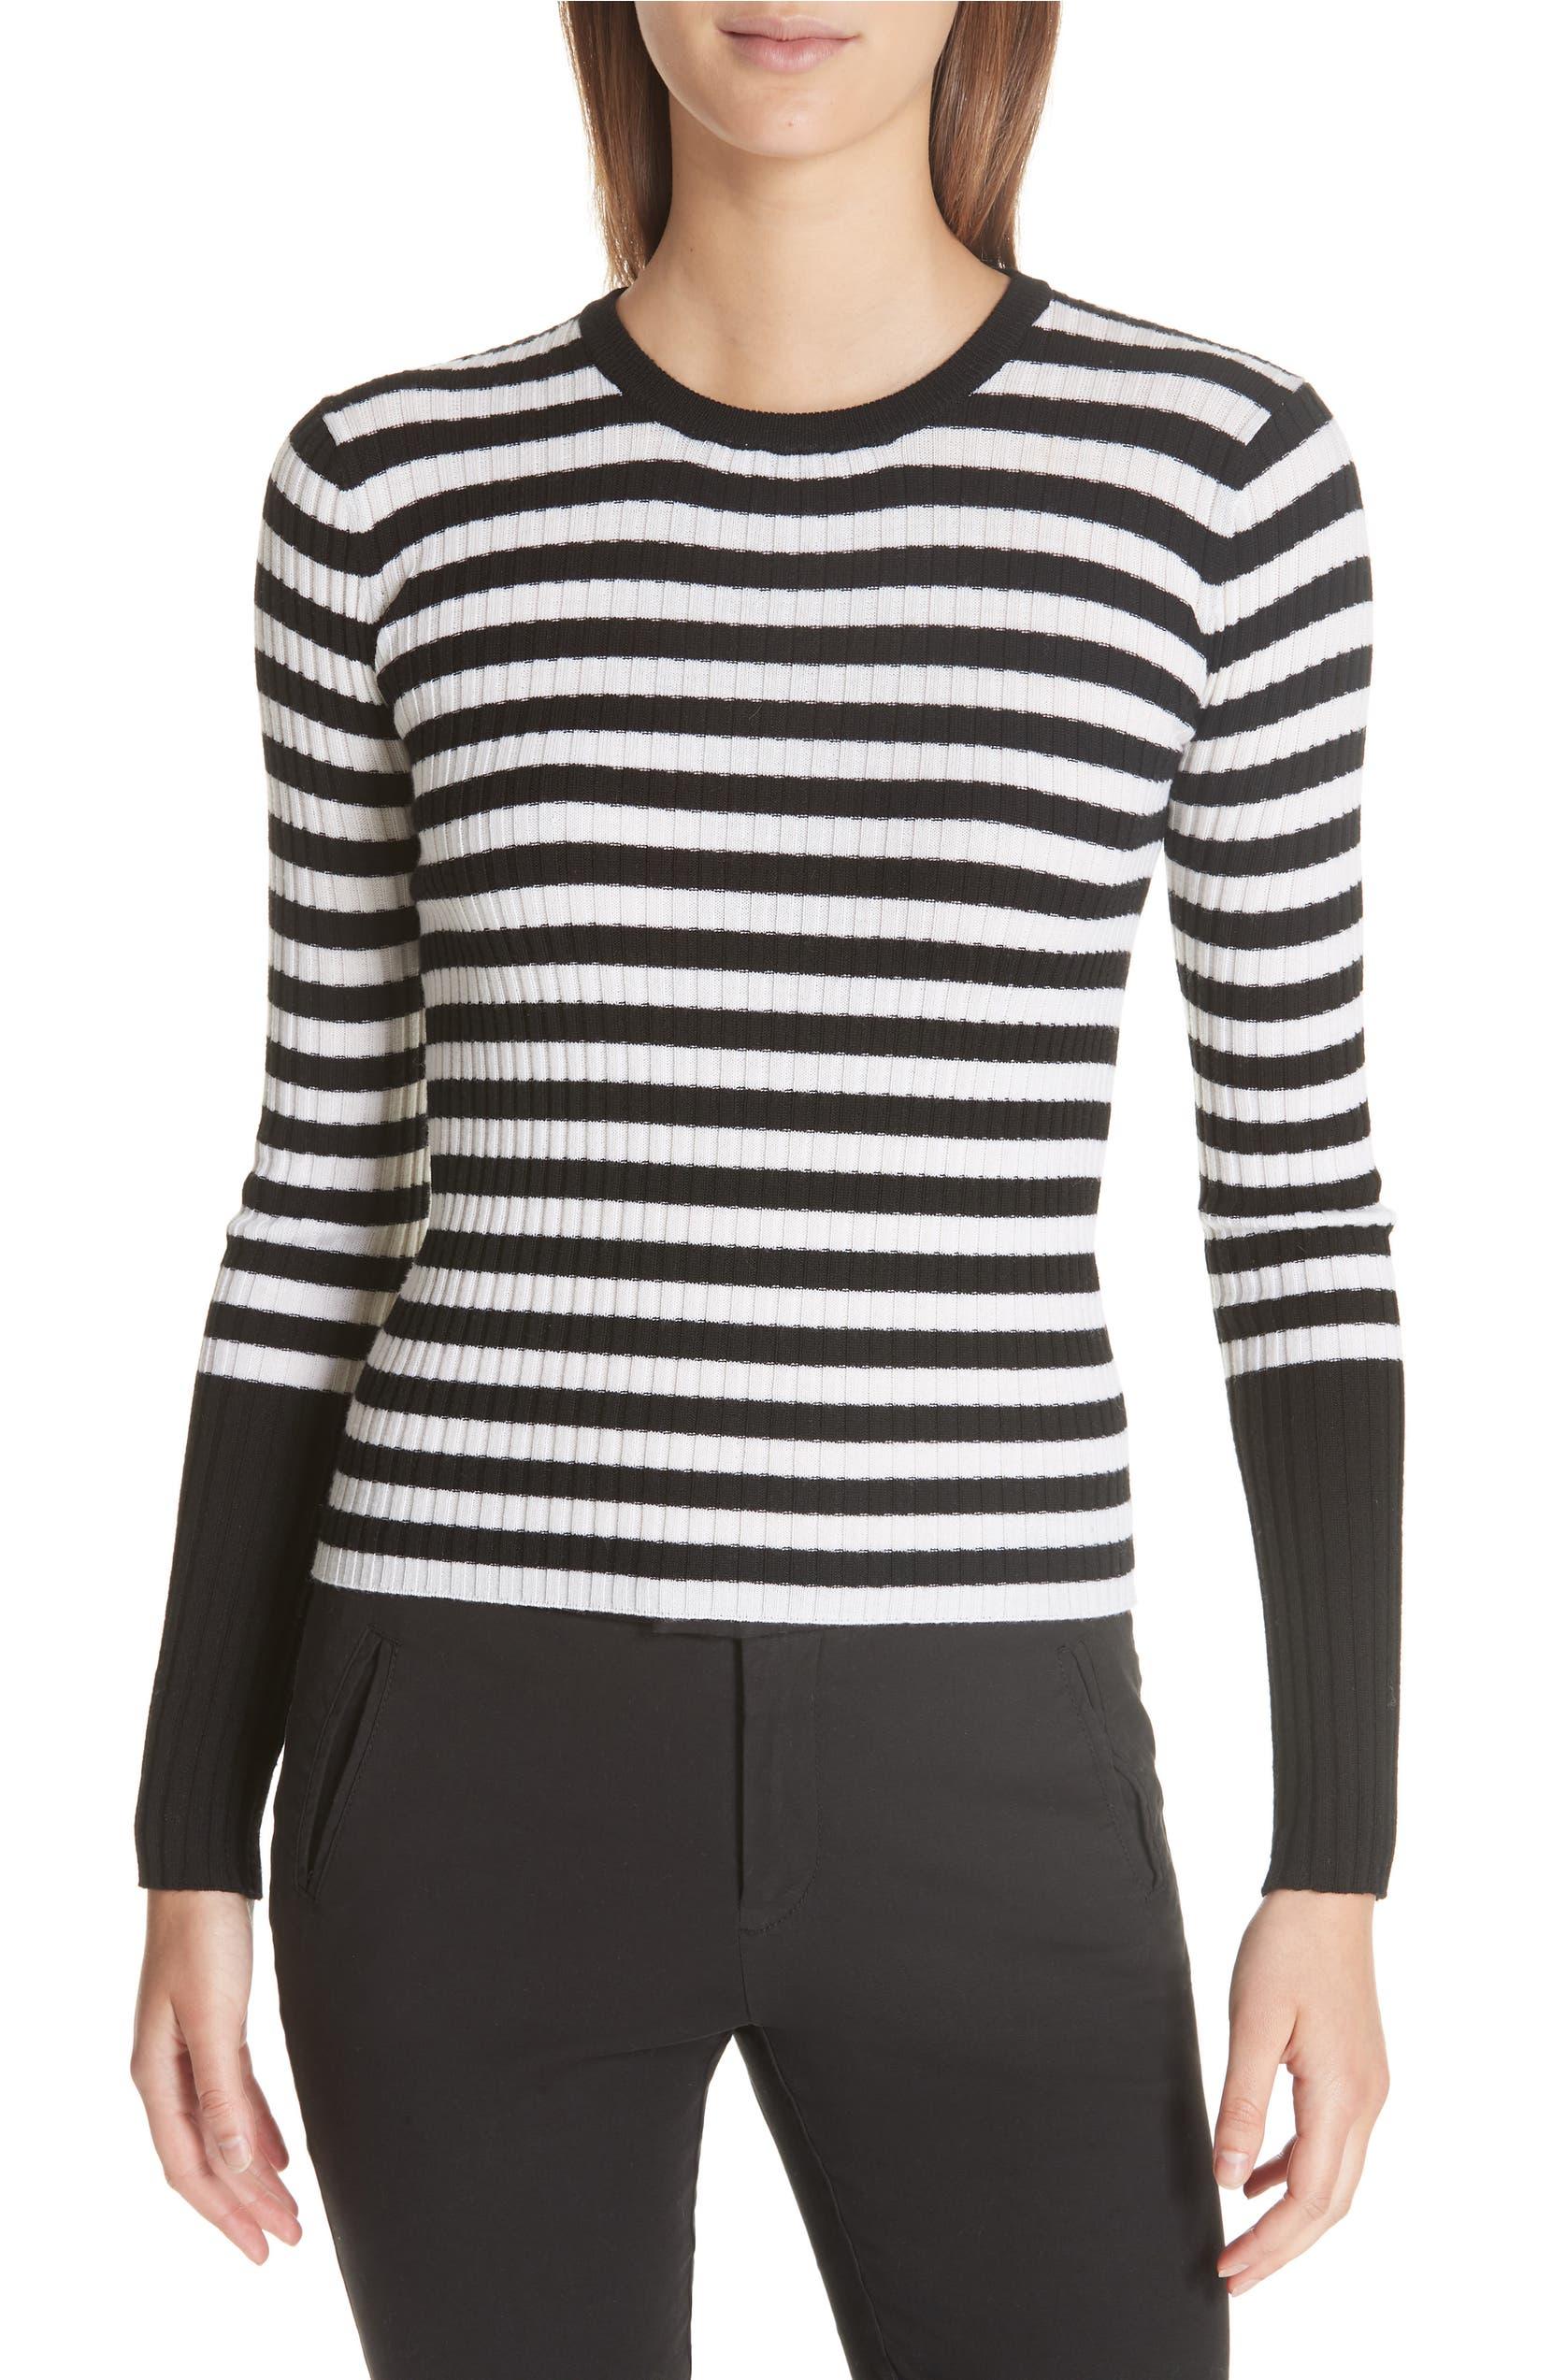 Striped Atm Wool Anthony Melillo Rib Thomas Sweater Knit qnHp1vAag